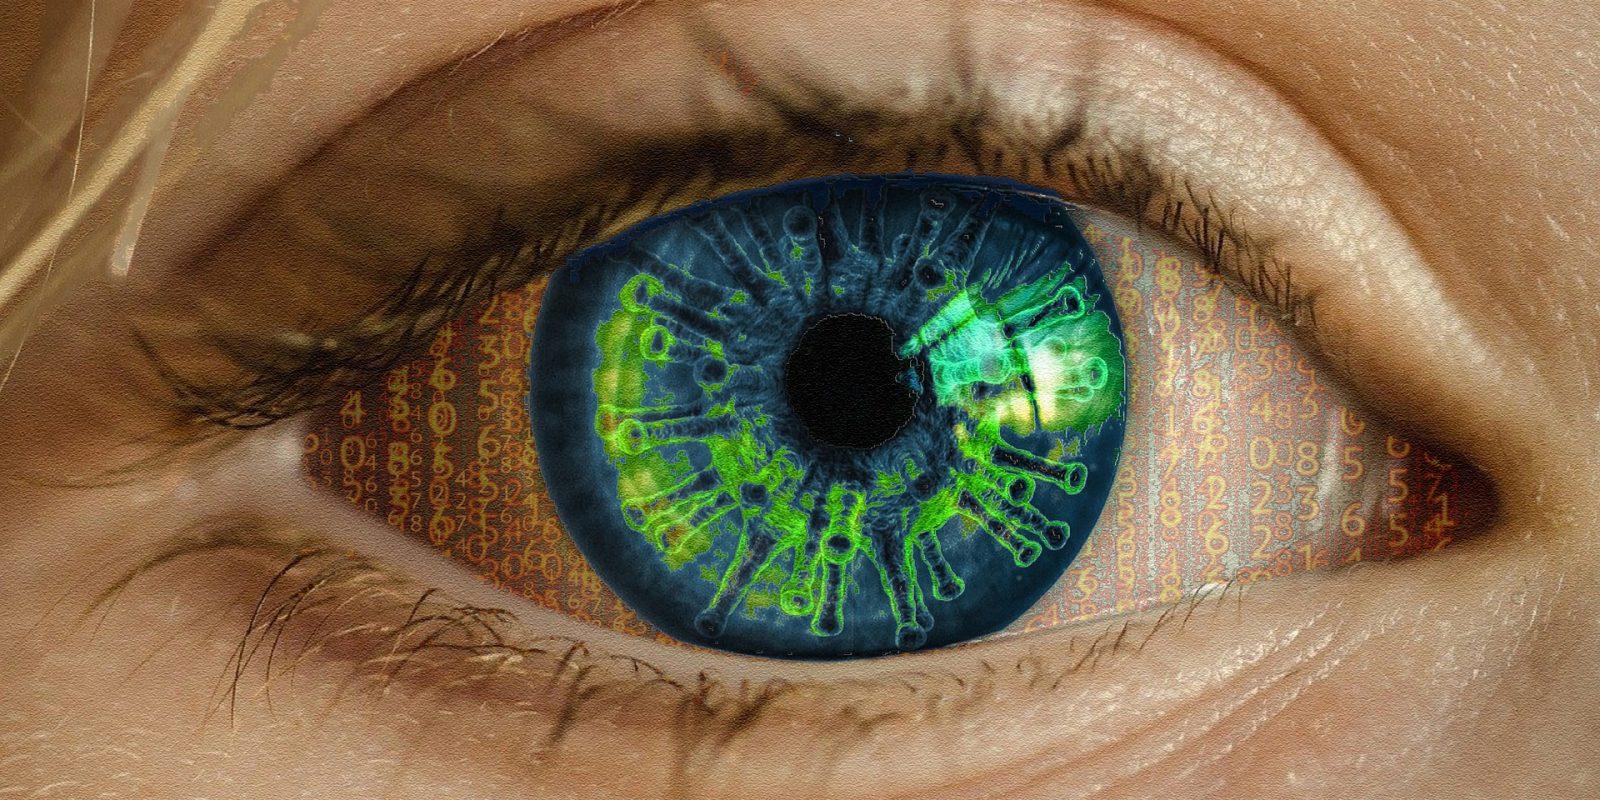 eye-5061291_1920 - Omni Matryx de Pixabay